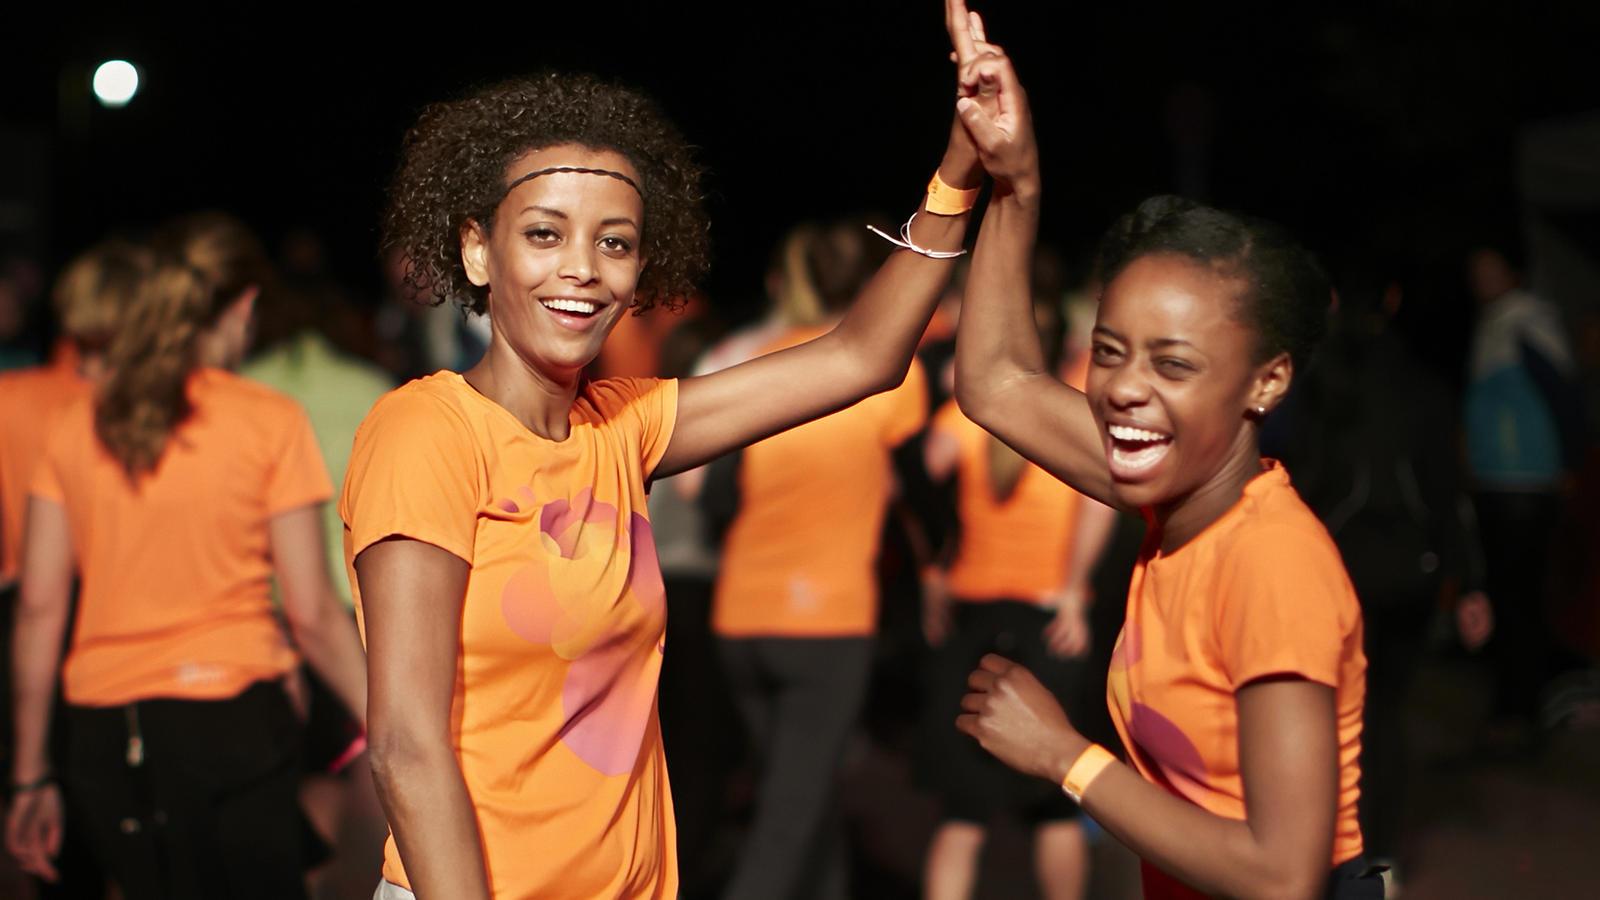 Nike Wotn Berlin 6